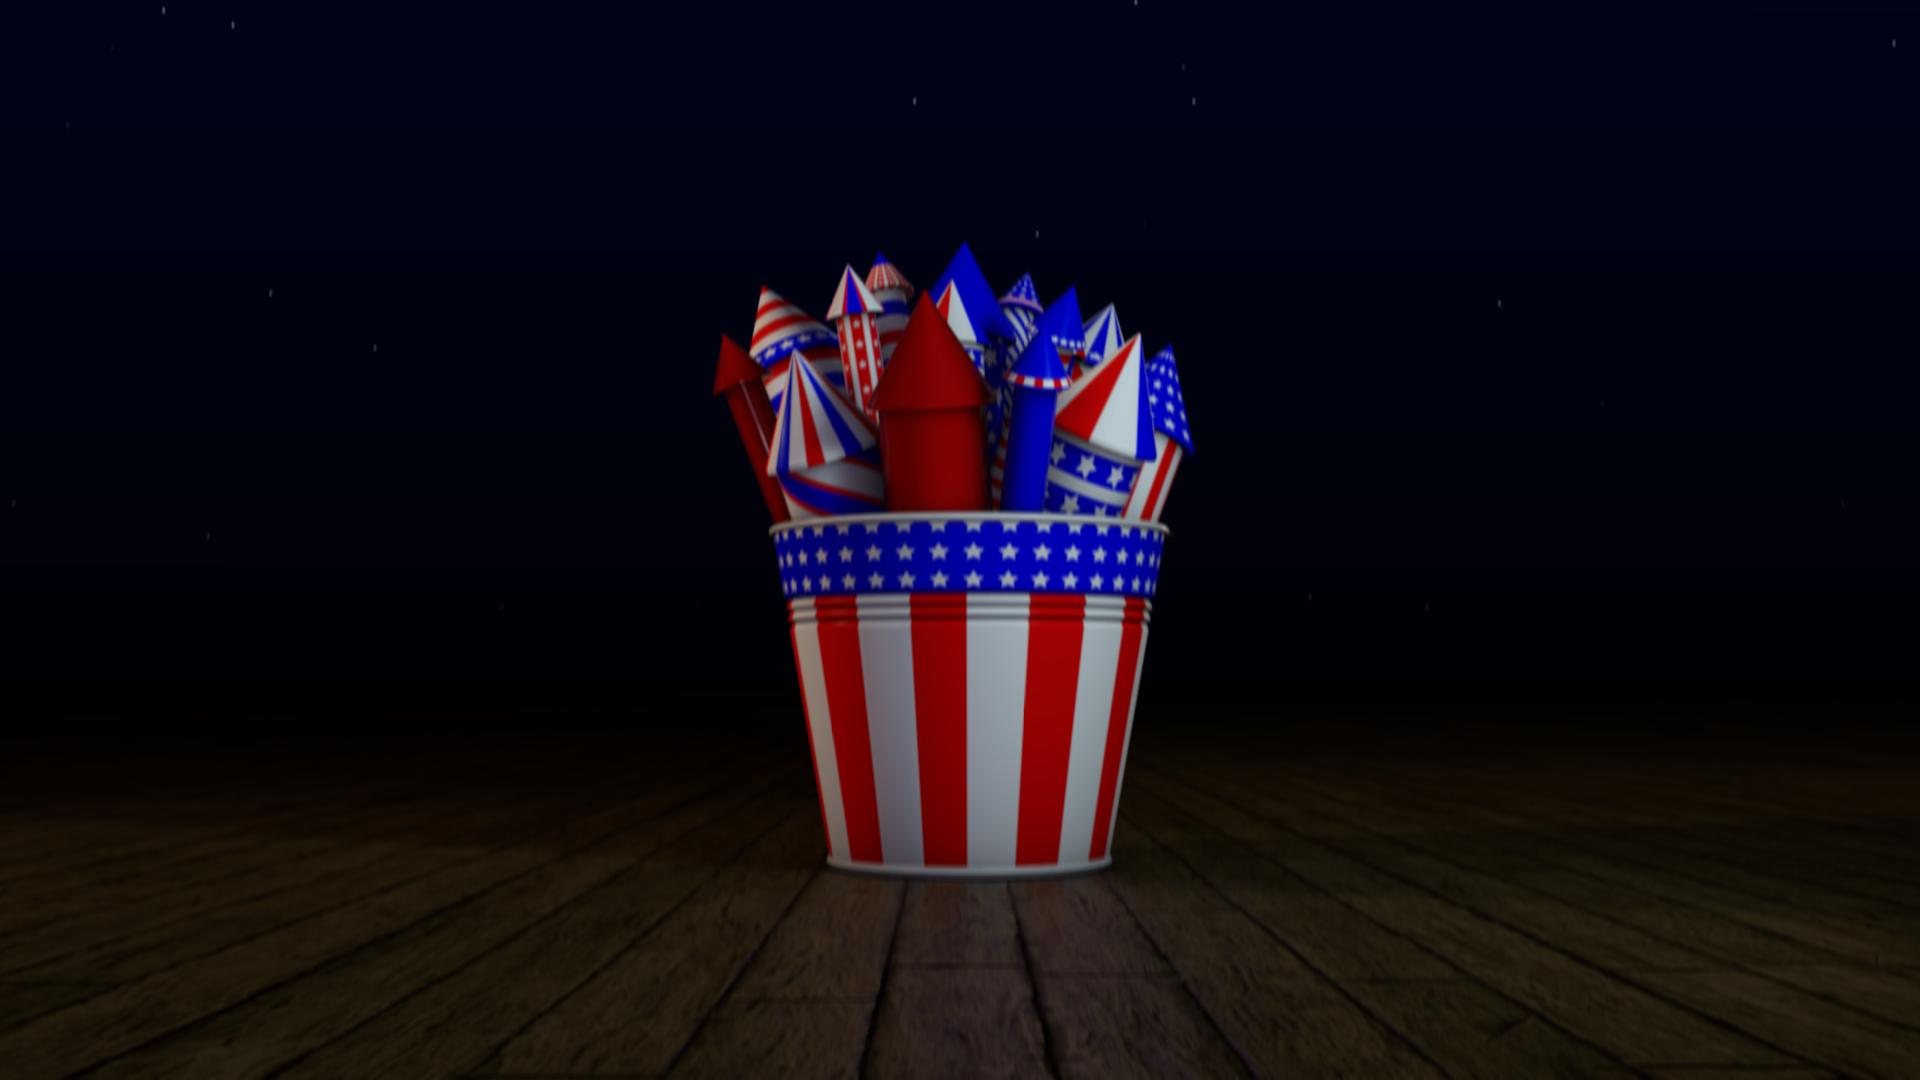 Rocket Fireworks Ecard